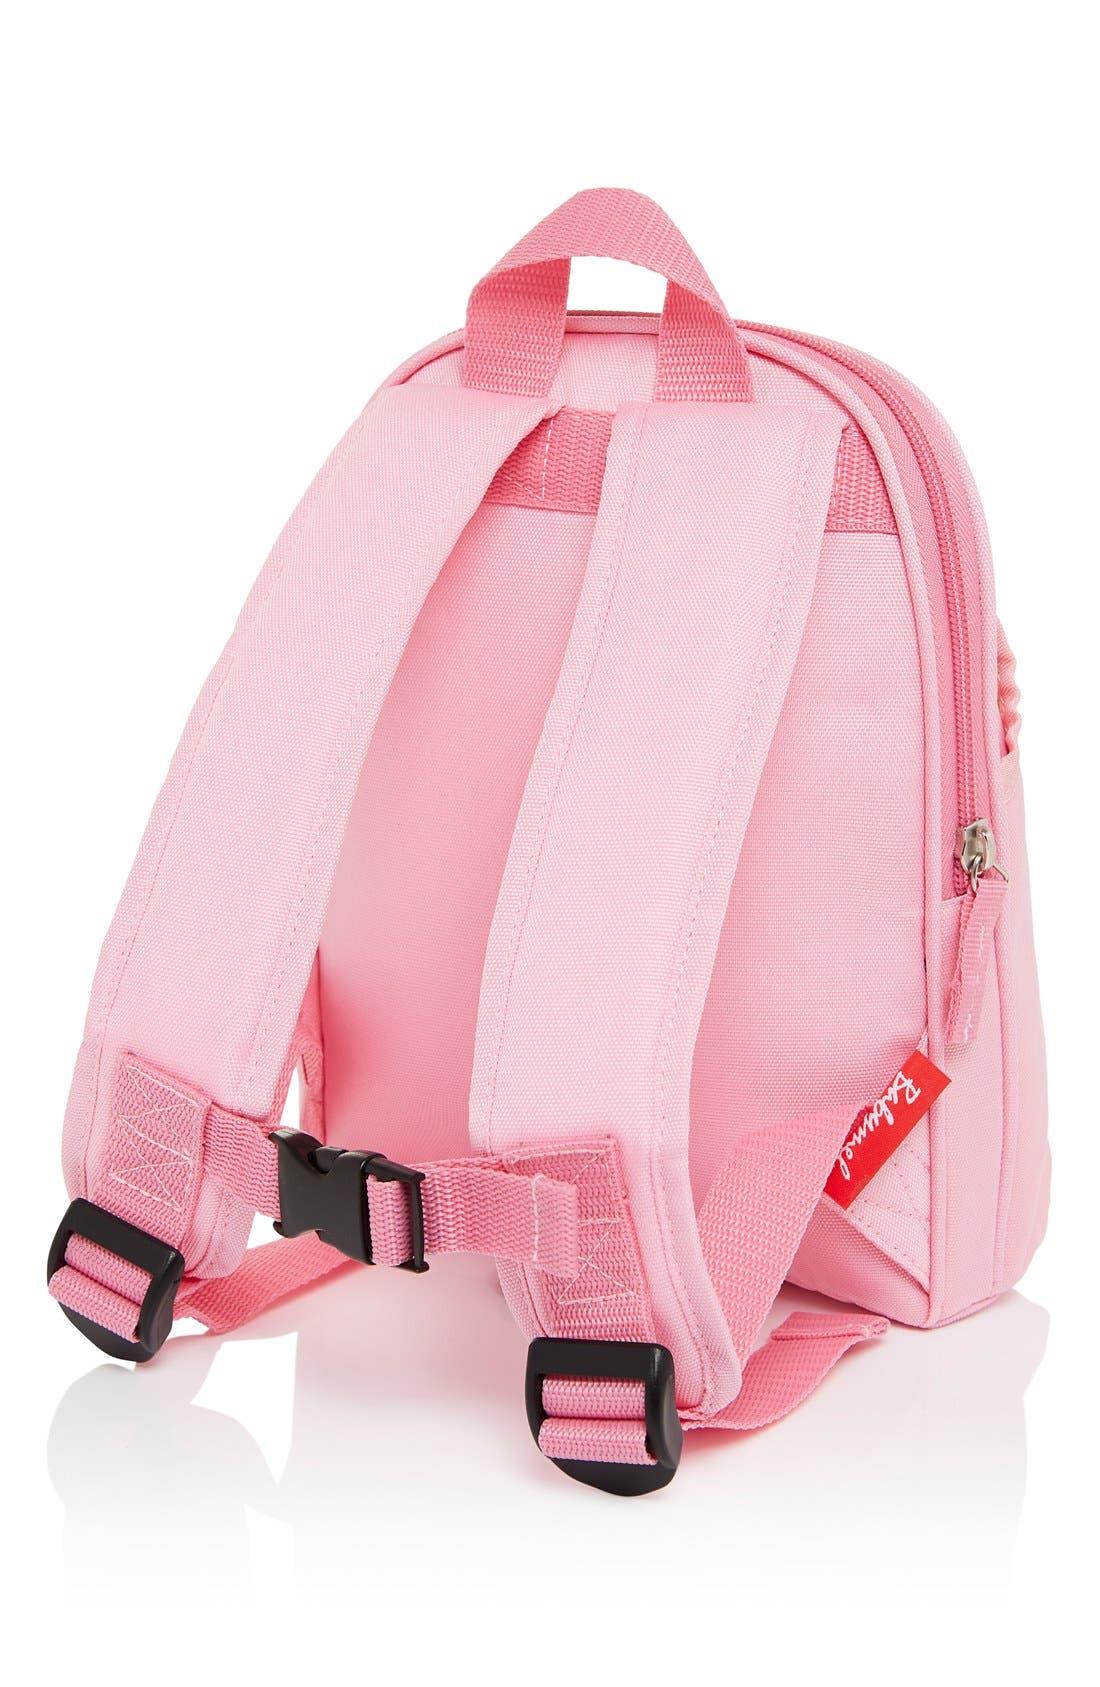 Graphic Mini Backpack,                             Alternate thumbnail 5, color,                             DAISY DRAGON CASTLE